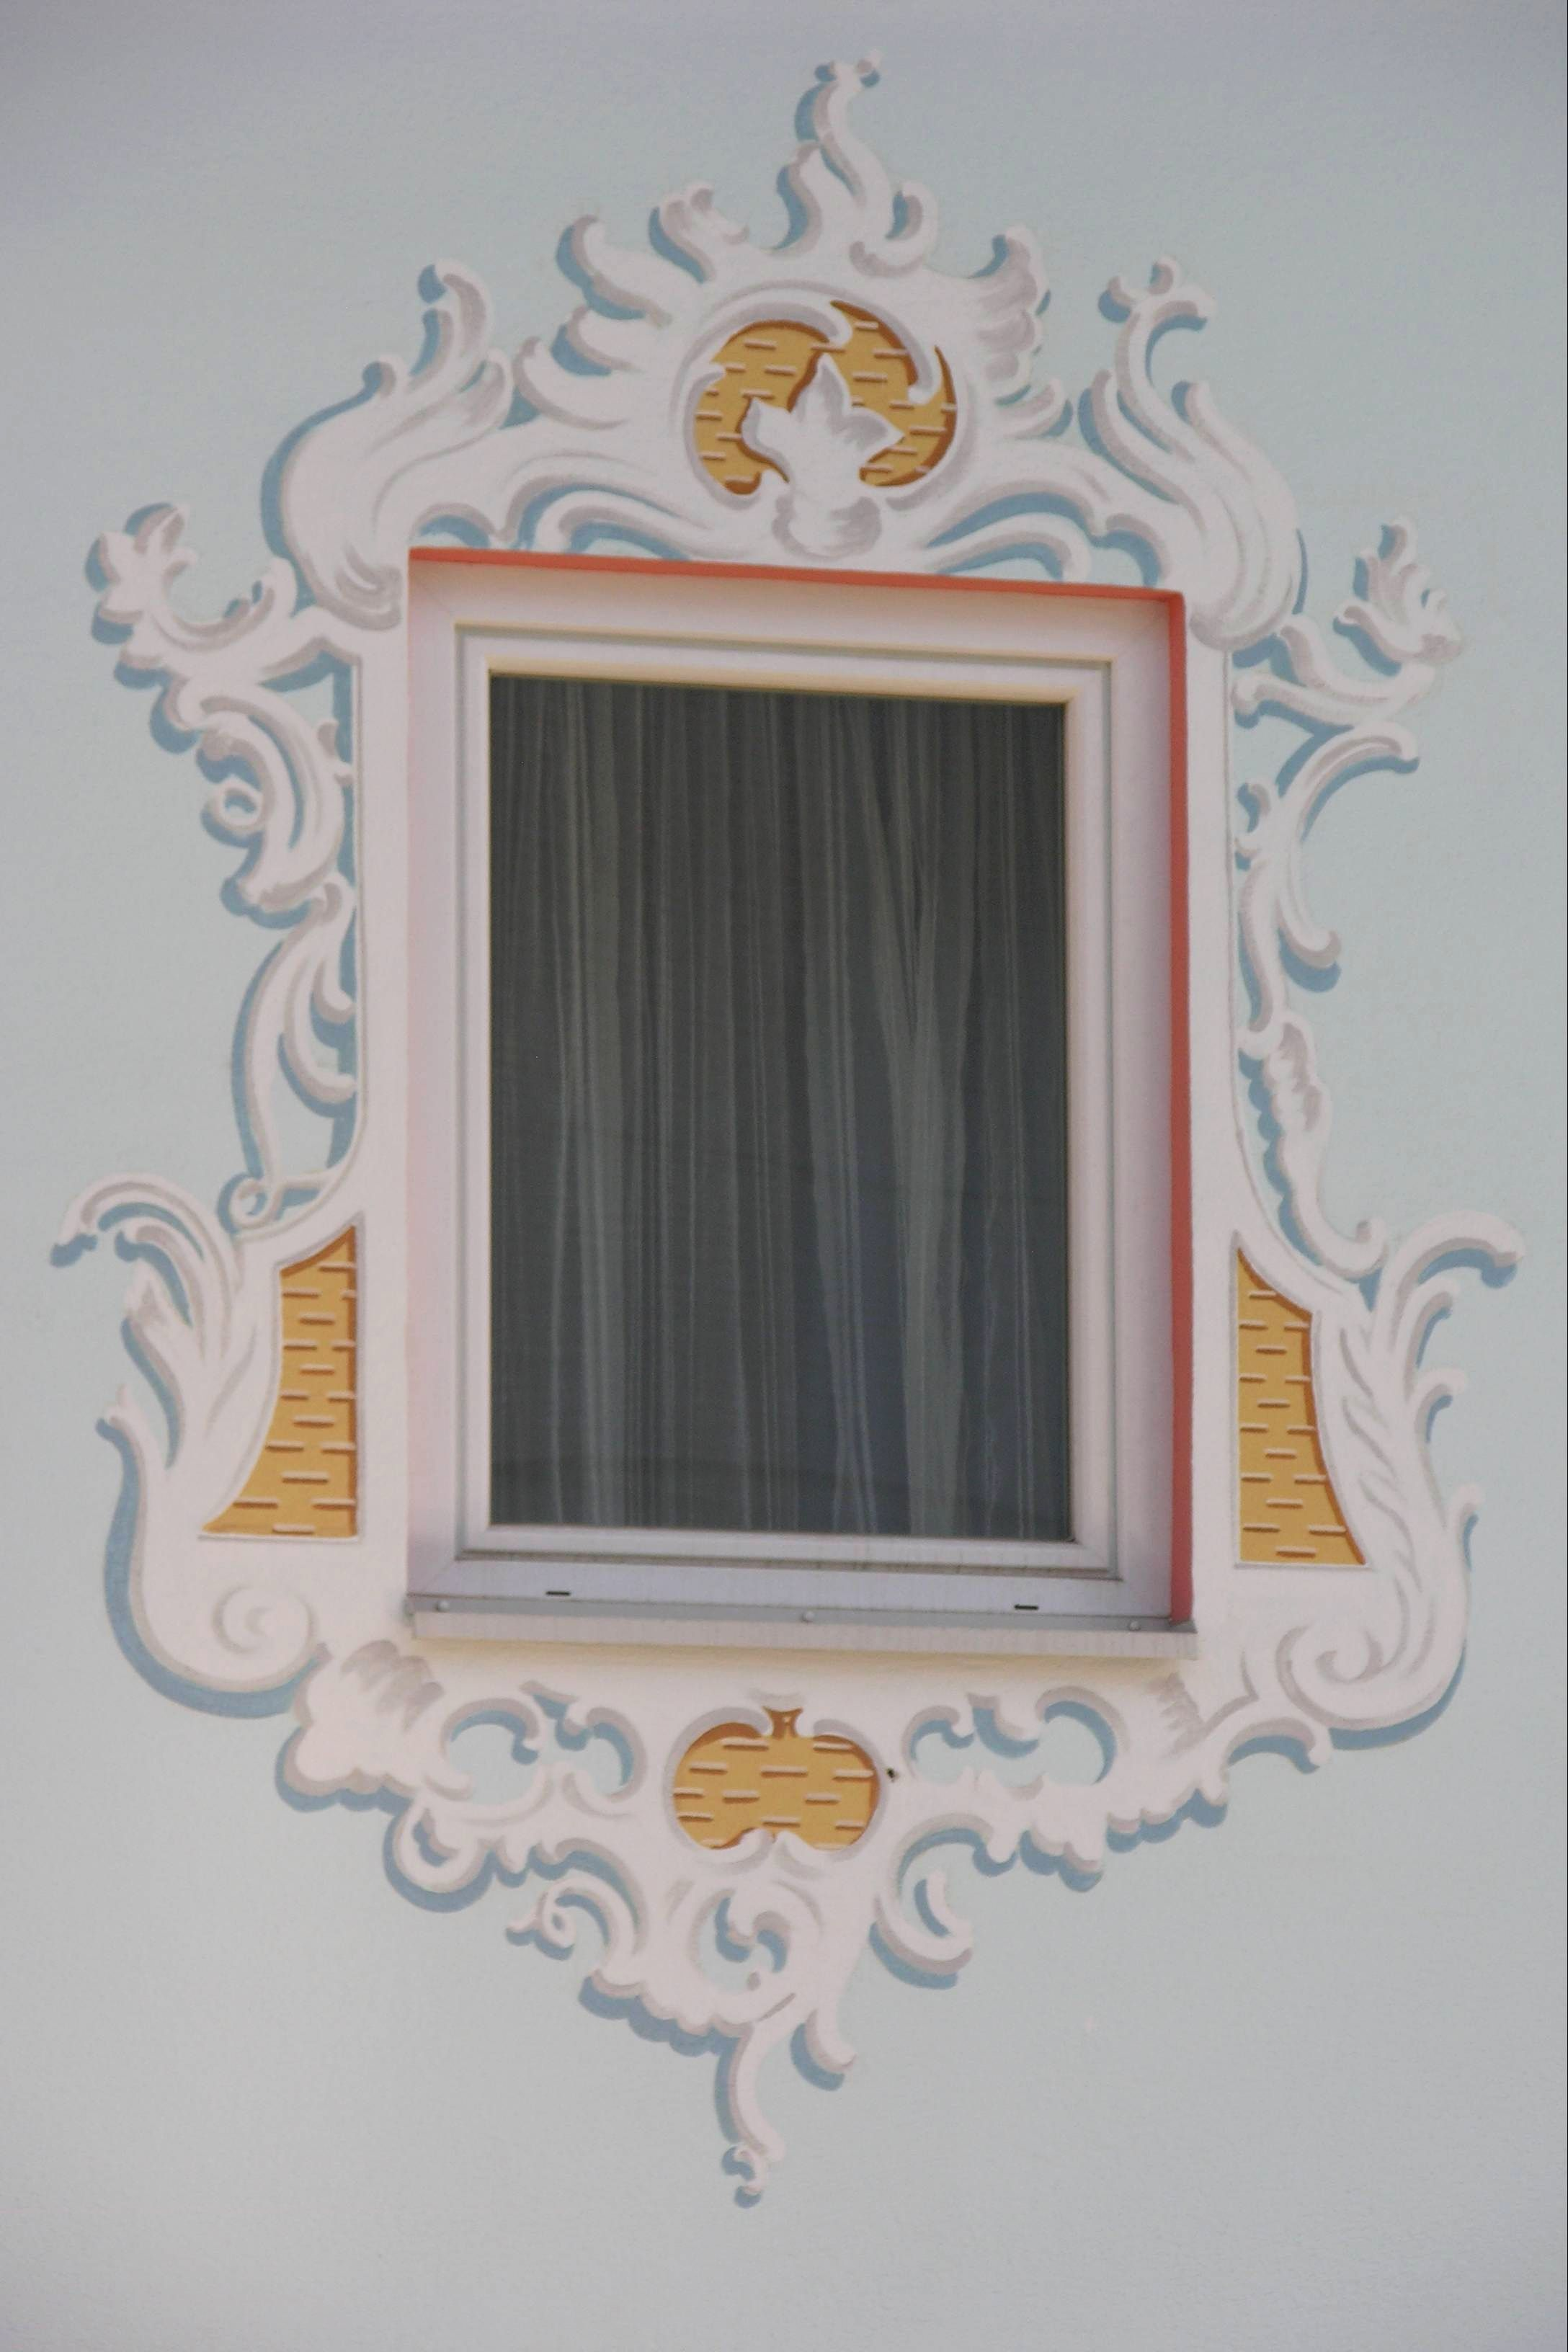 rekonstruierte l ftlmalerei nach generalsanierter neu verputzter fassade f r fenster am. Black Bedroom Furniture Sets. Home Design Ideas